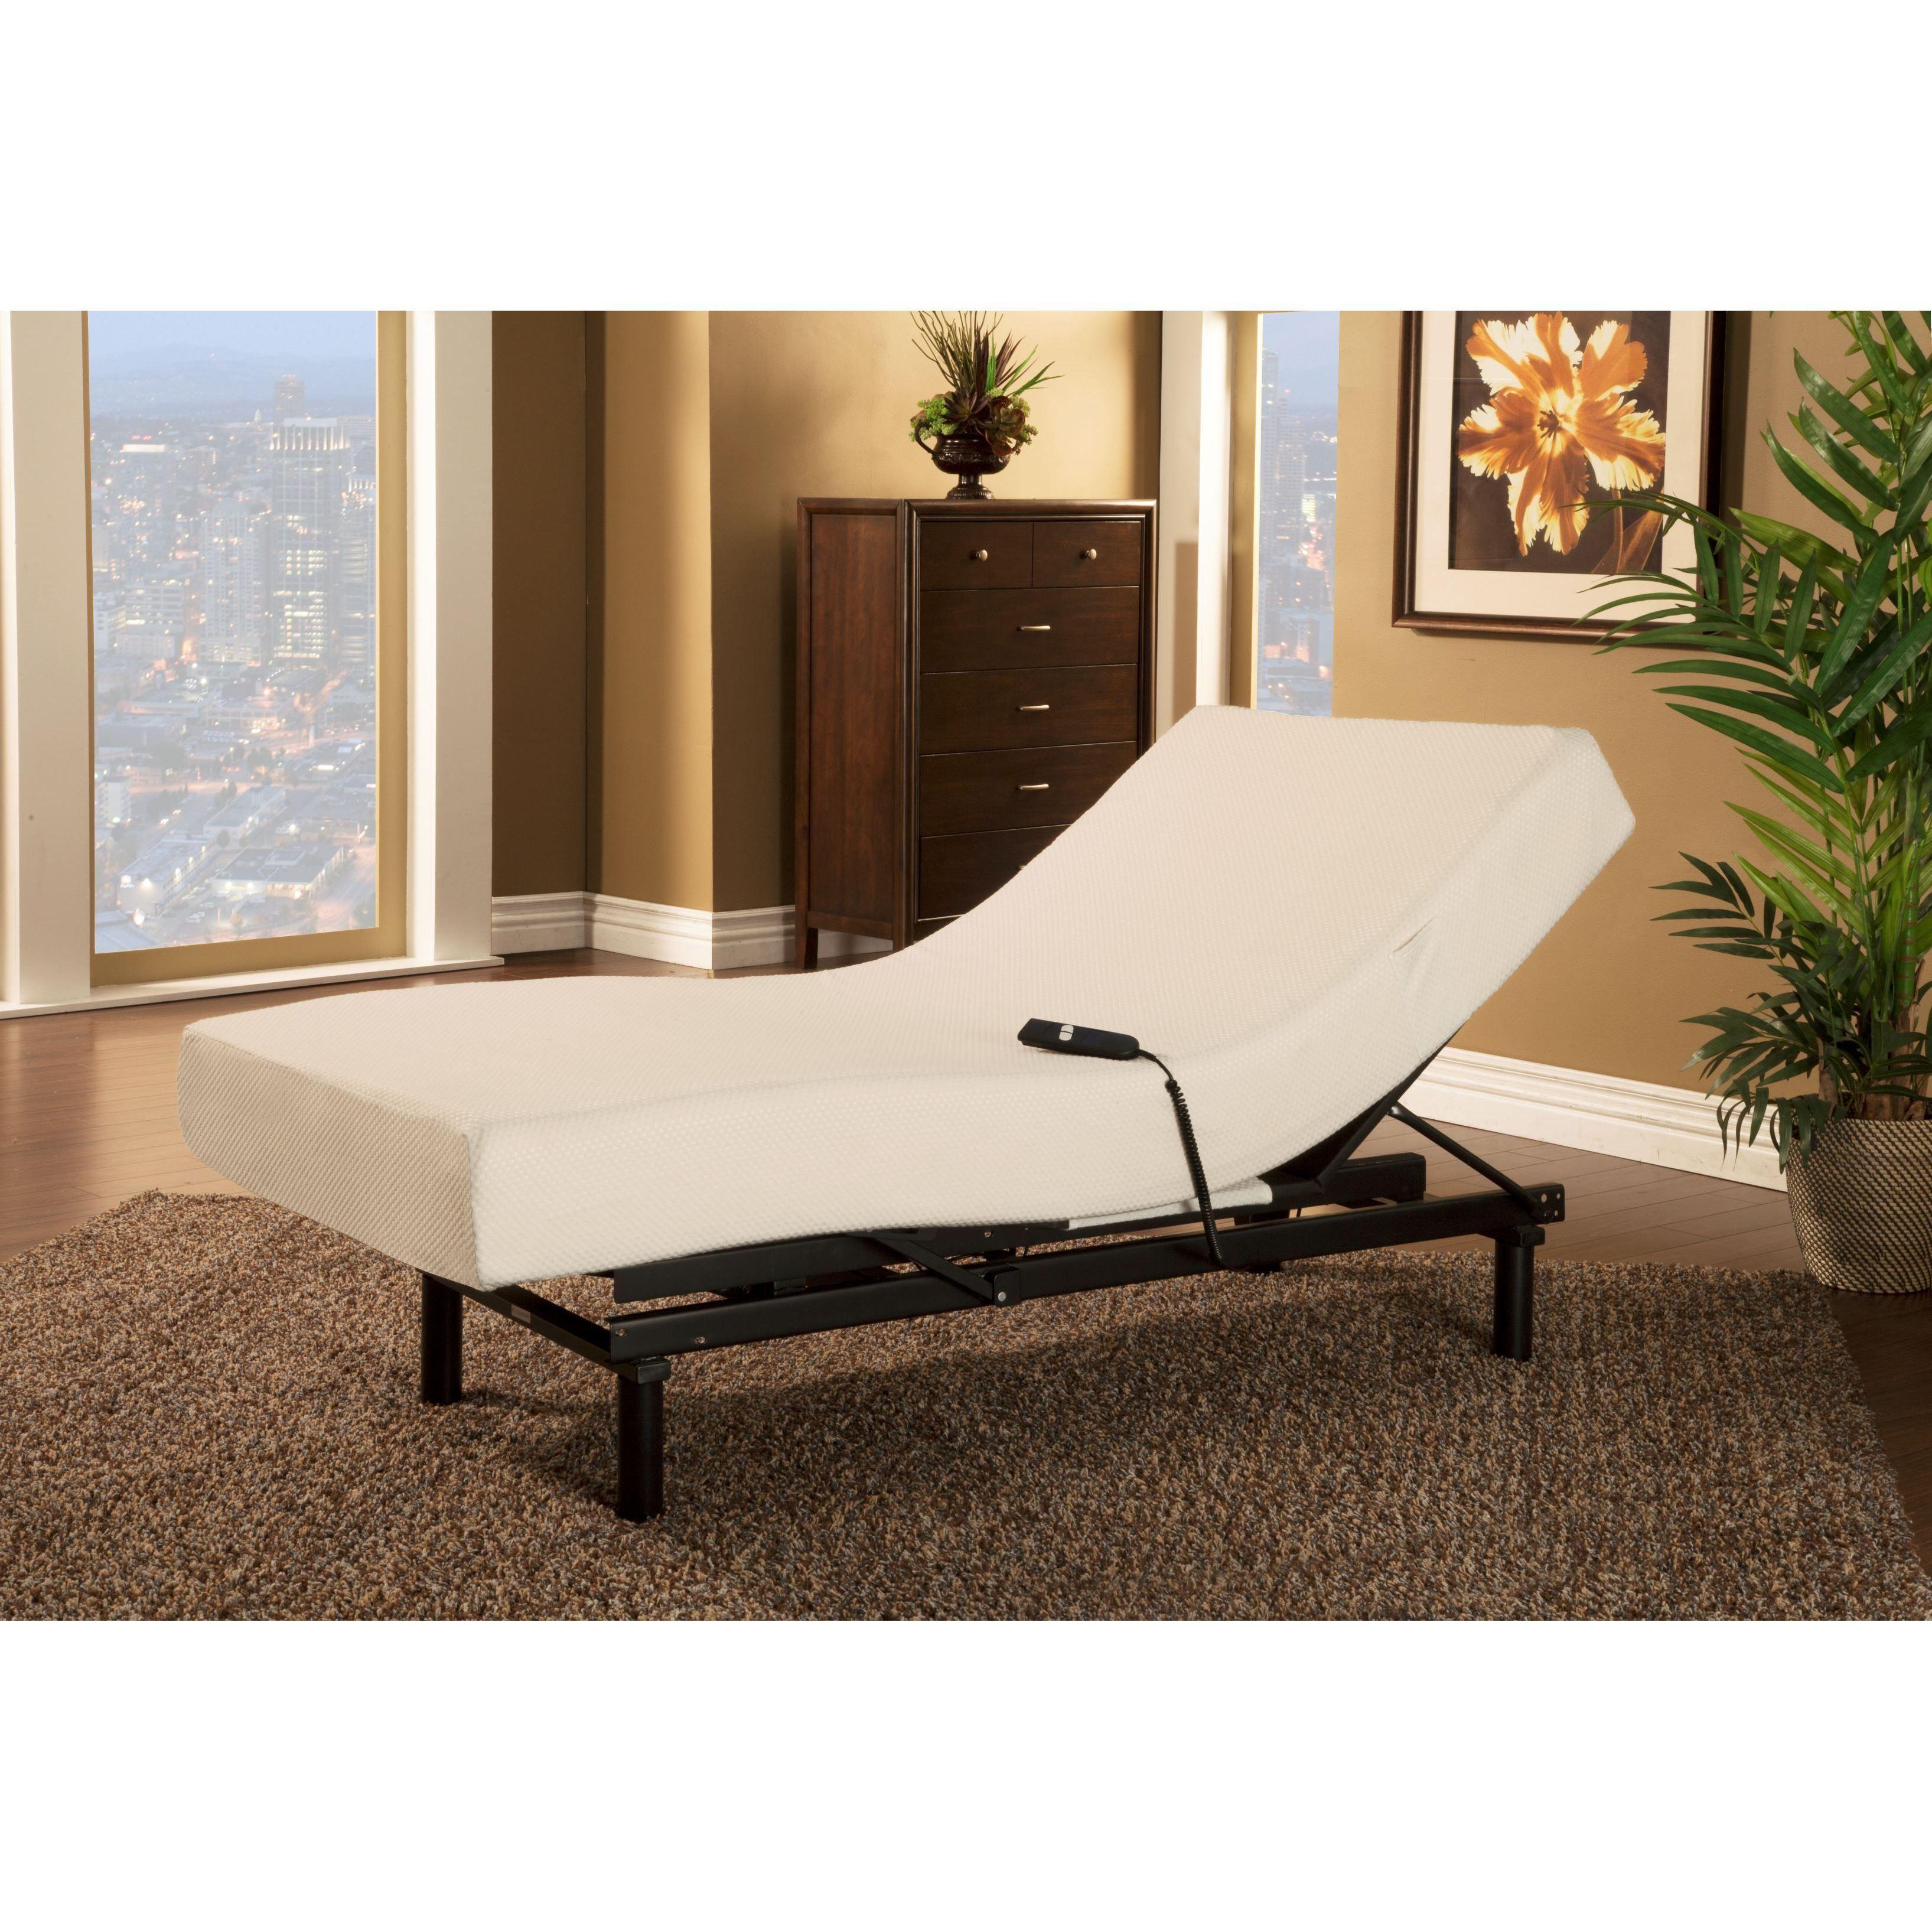 Sleep Zone Loft Single Motor Adjustable Bed with Twin XL